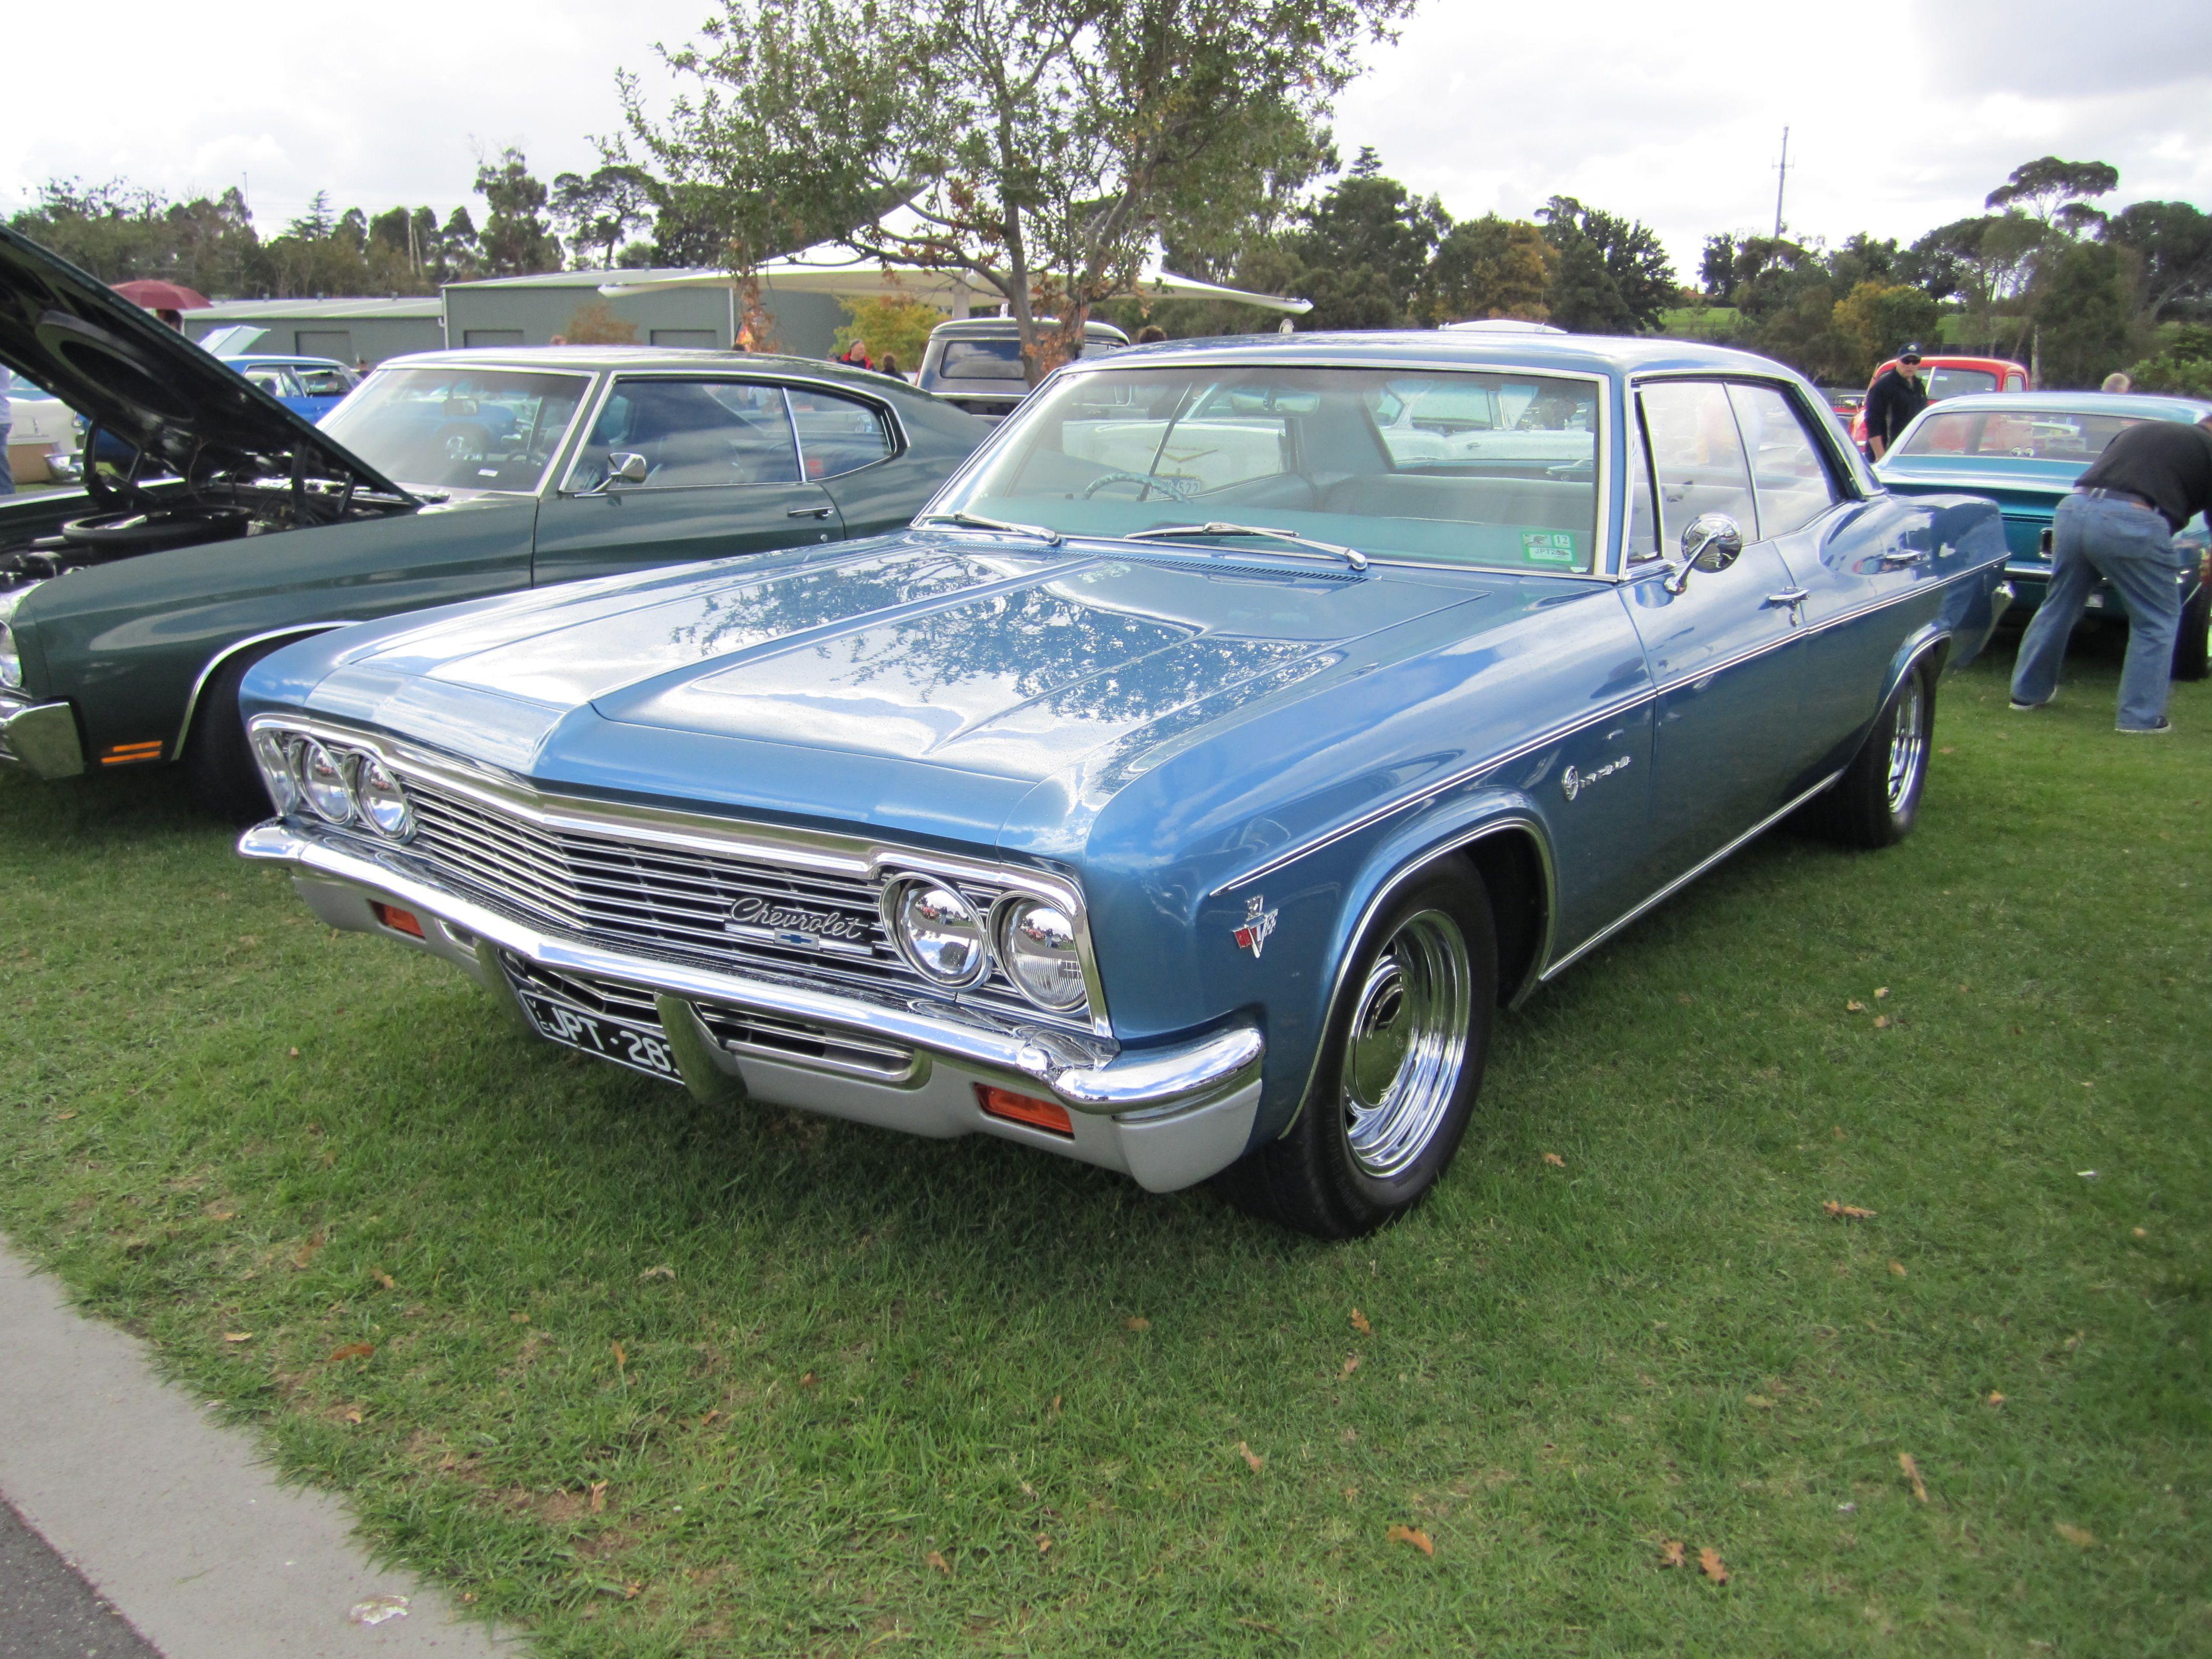 1966 chevy impala for sale  File 1966 Chevrolet Impala 4 door